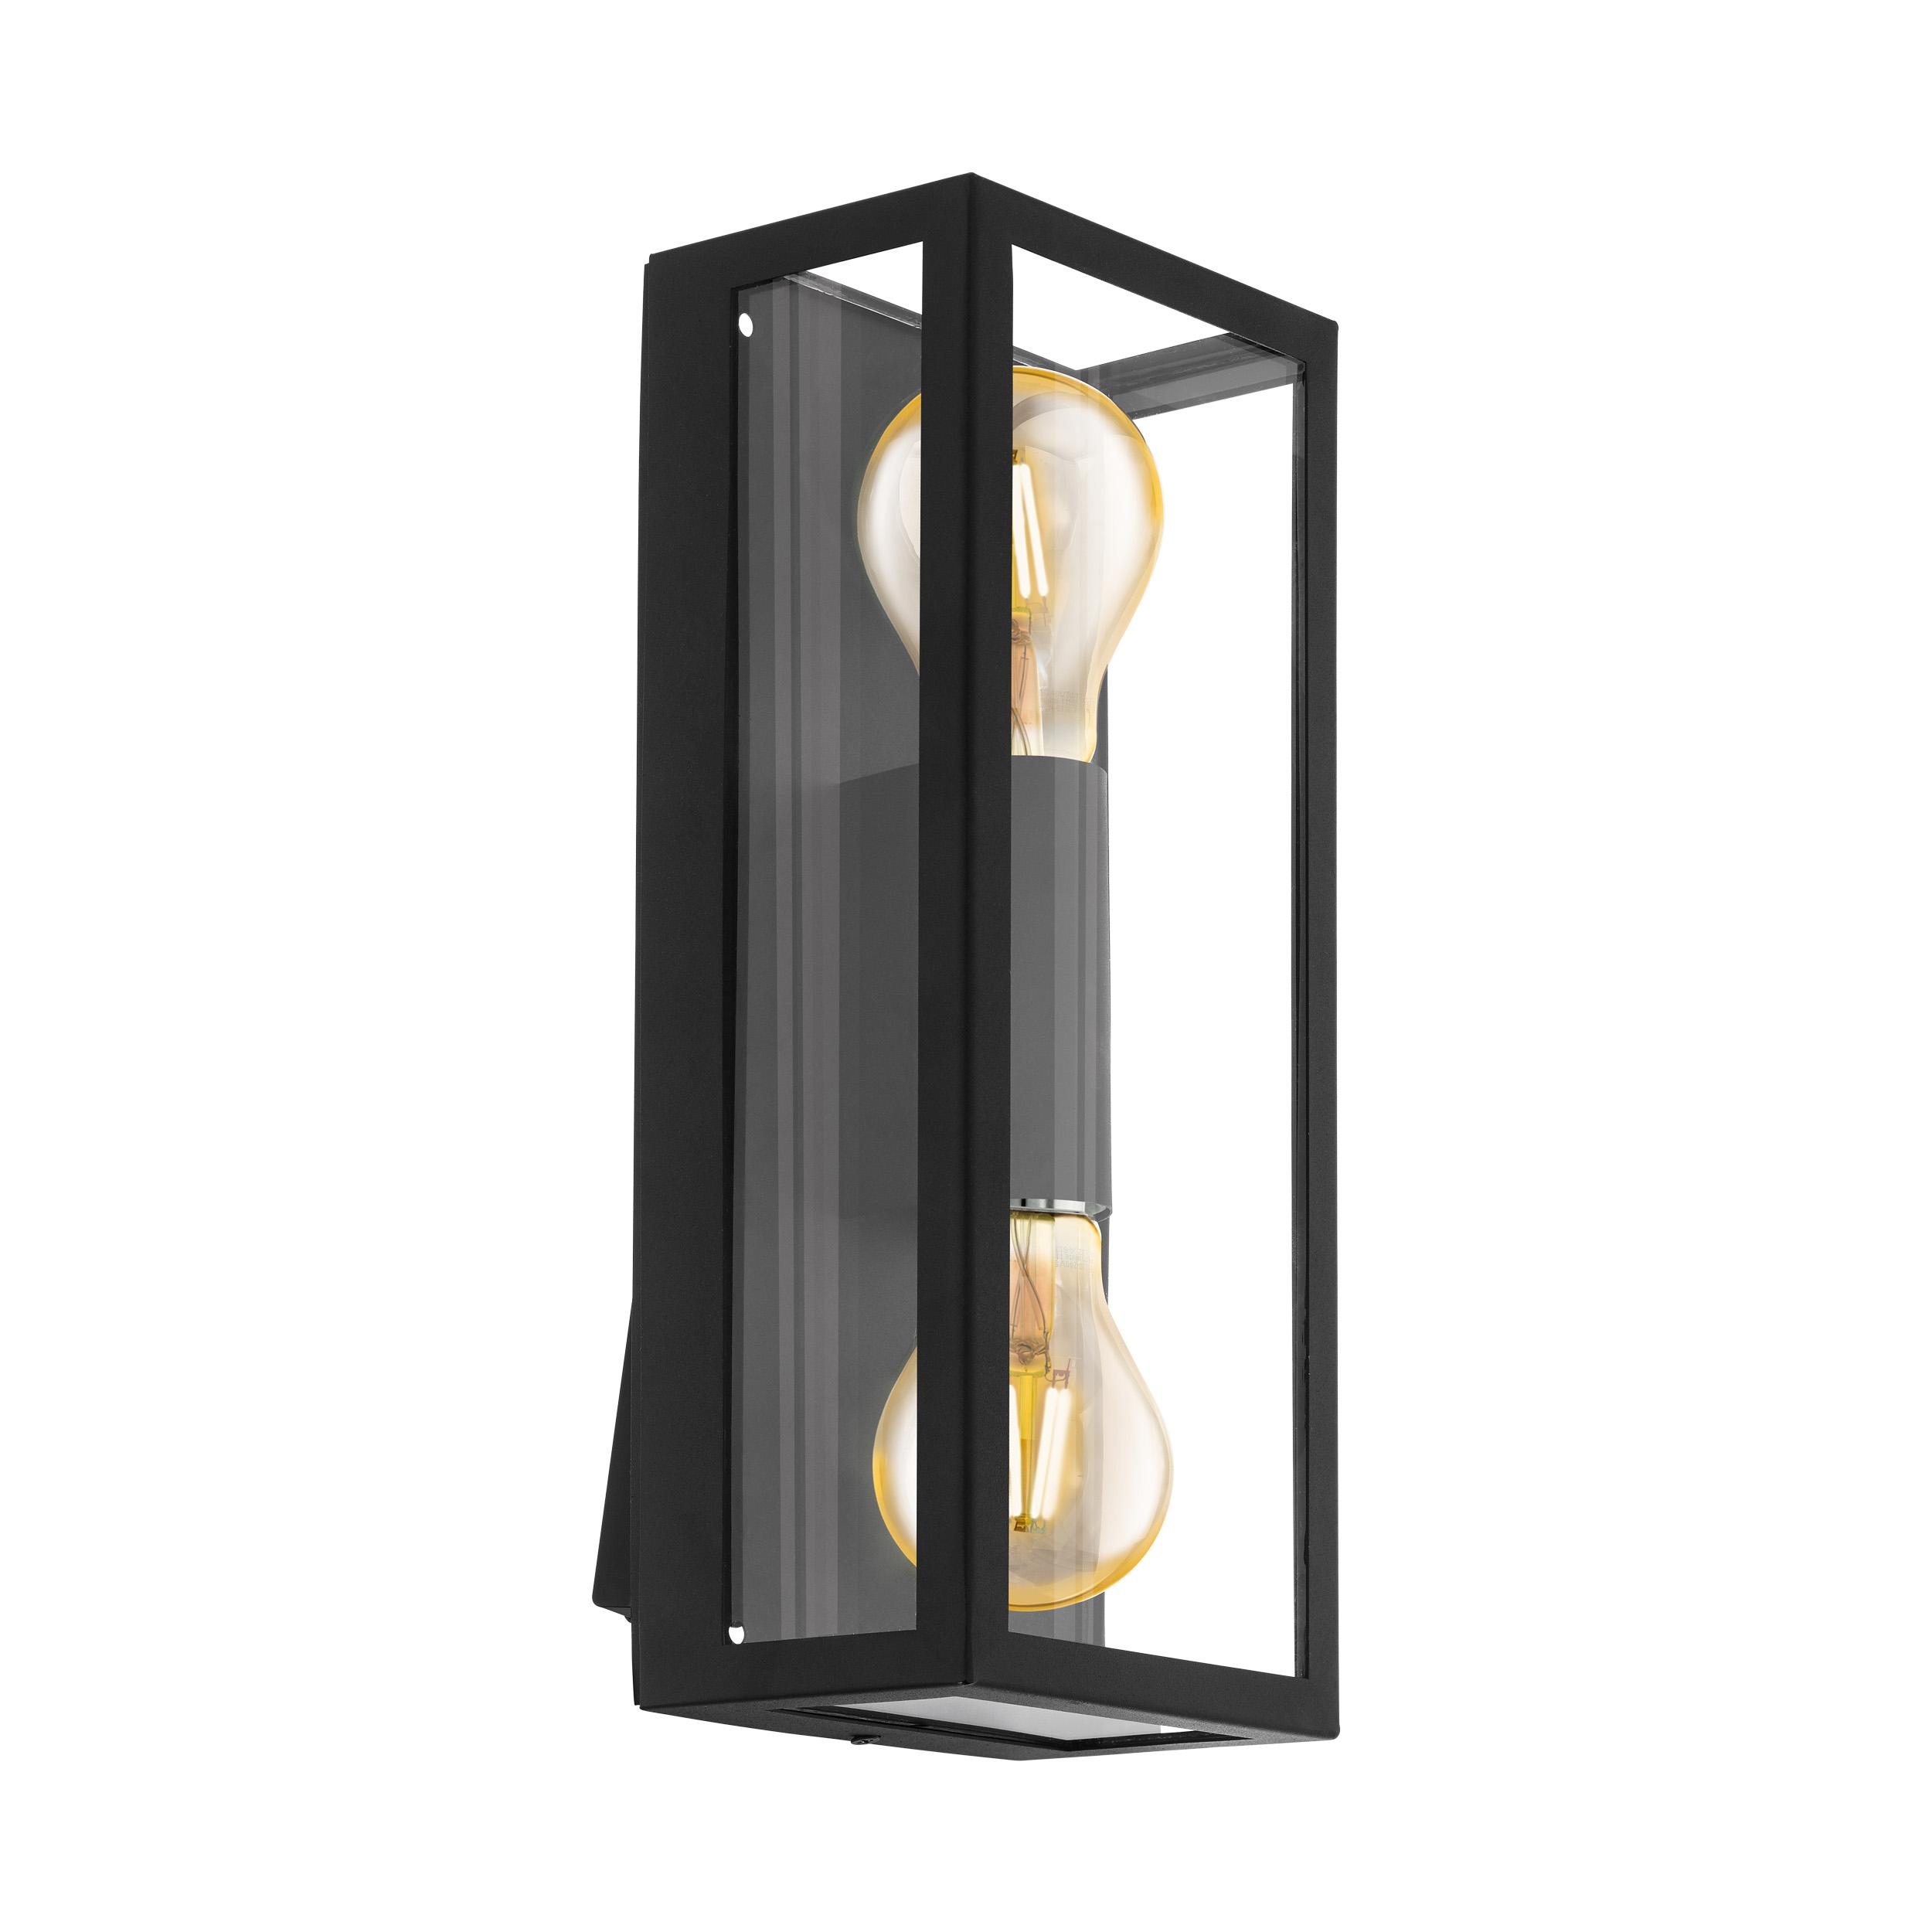 Wandlamp alamonte 1 E27 zwart/helder